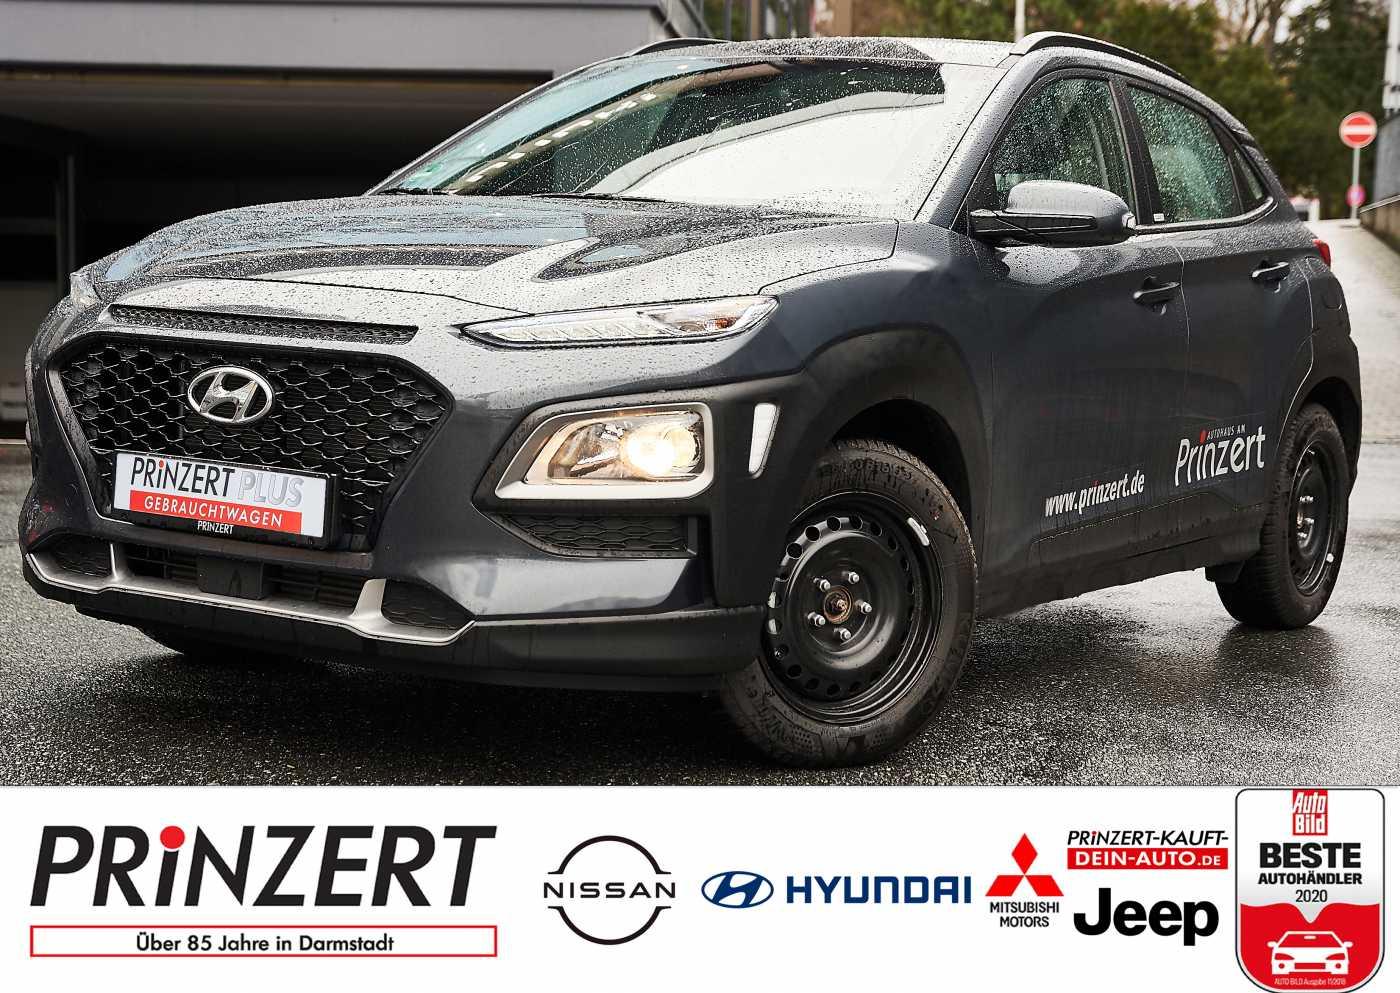 Hyundai Kona 1.0 T-GDI 'Trend' 17 Zoll Navi, Jahr 2020, Benzin